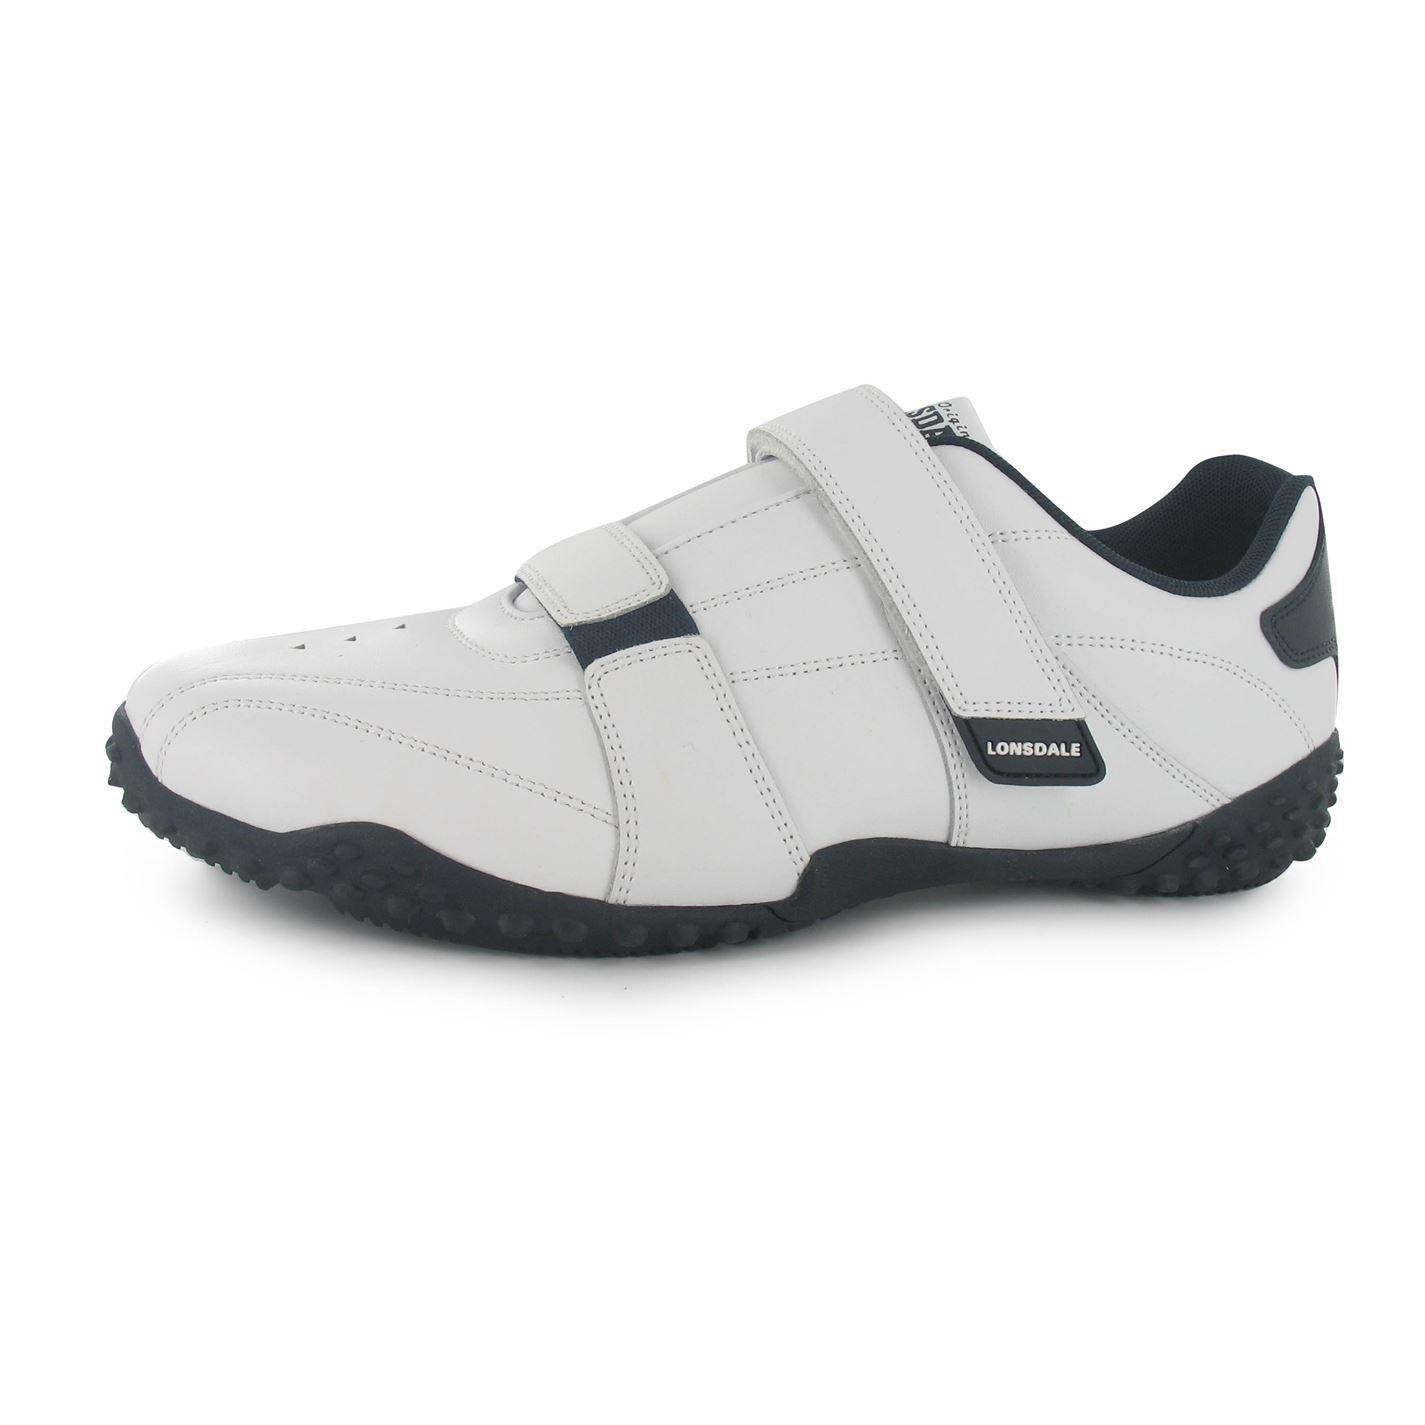 Lonsdale Herren Turnschuhe Sneakers Trainers Schuhe Freizeit Sport NEU Fulham 59